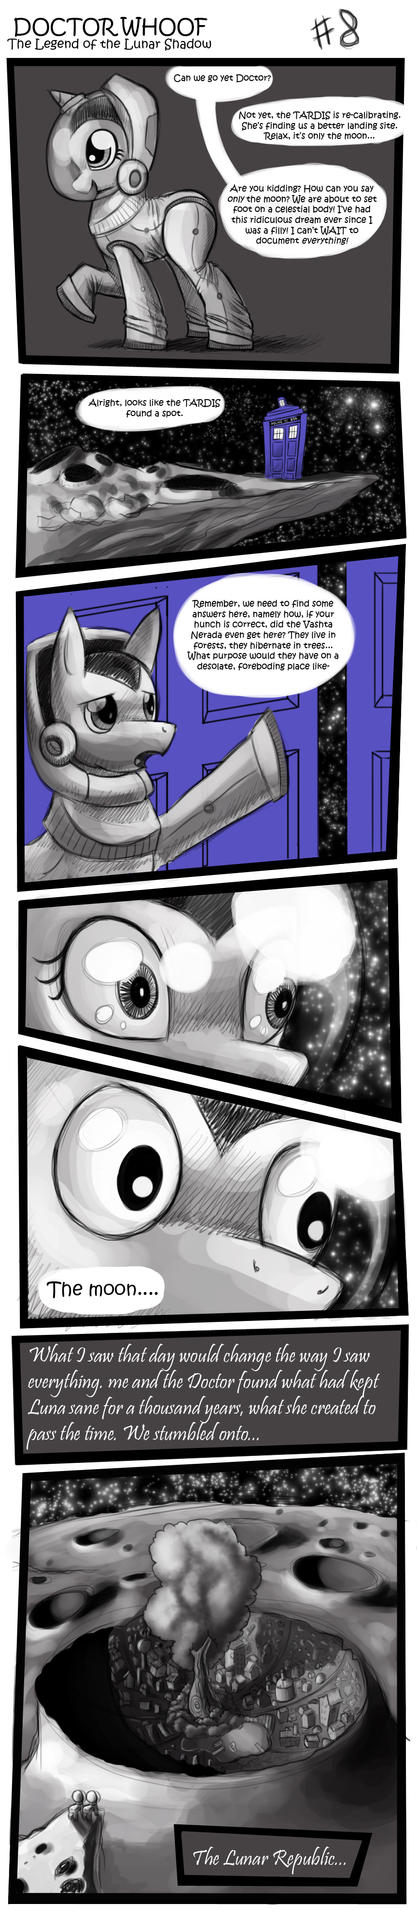 DOCTOR WHOOF  Lunar Shadow 8 by CyberToaster